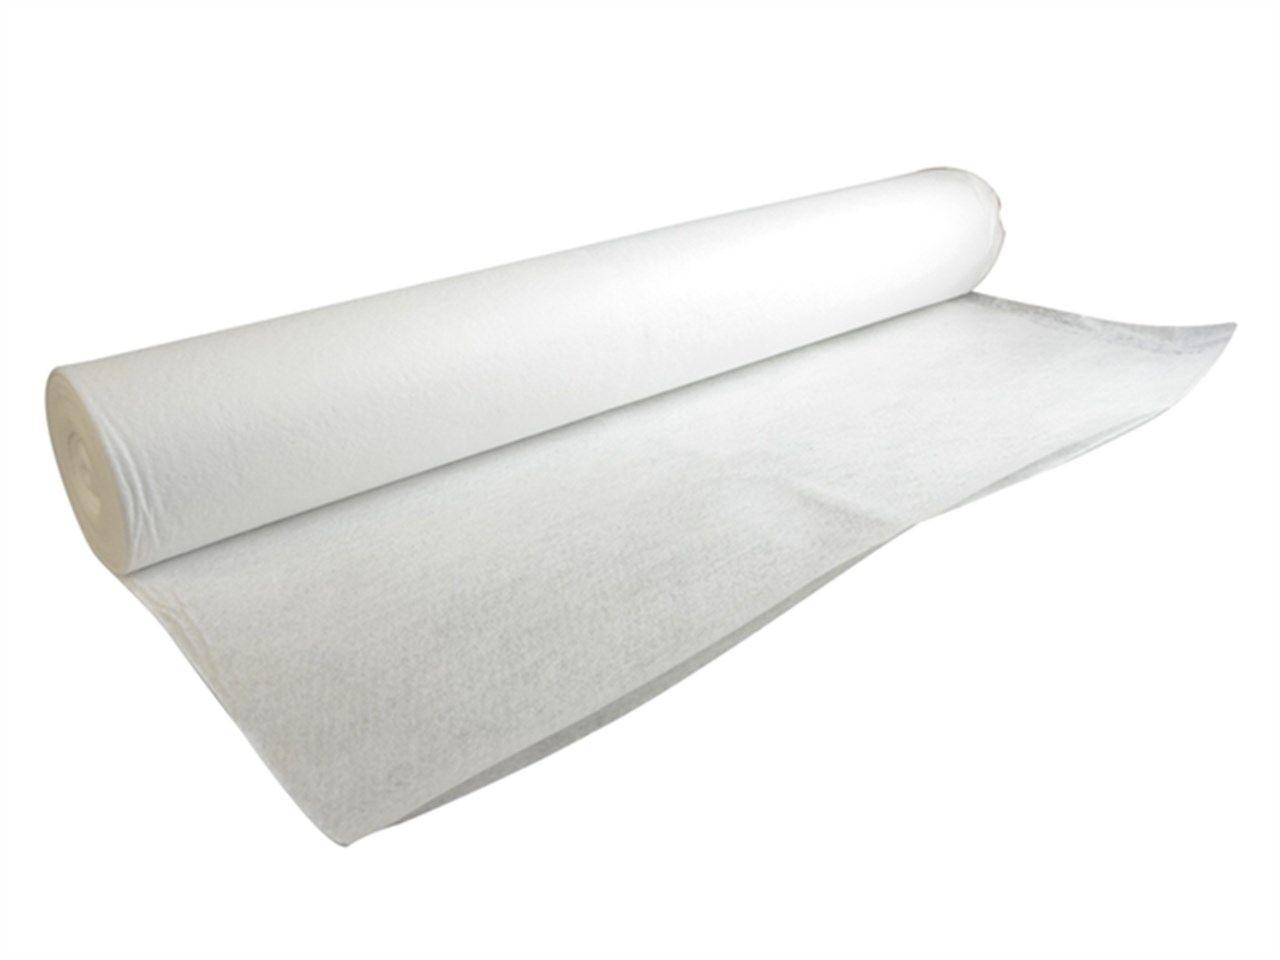 DrainTex Non-Woven Geotextile Fabric Roll - 4.5 x 100m (450m2)